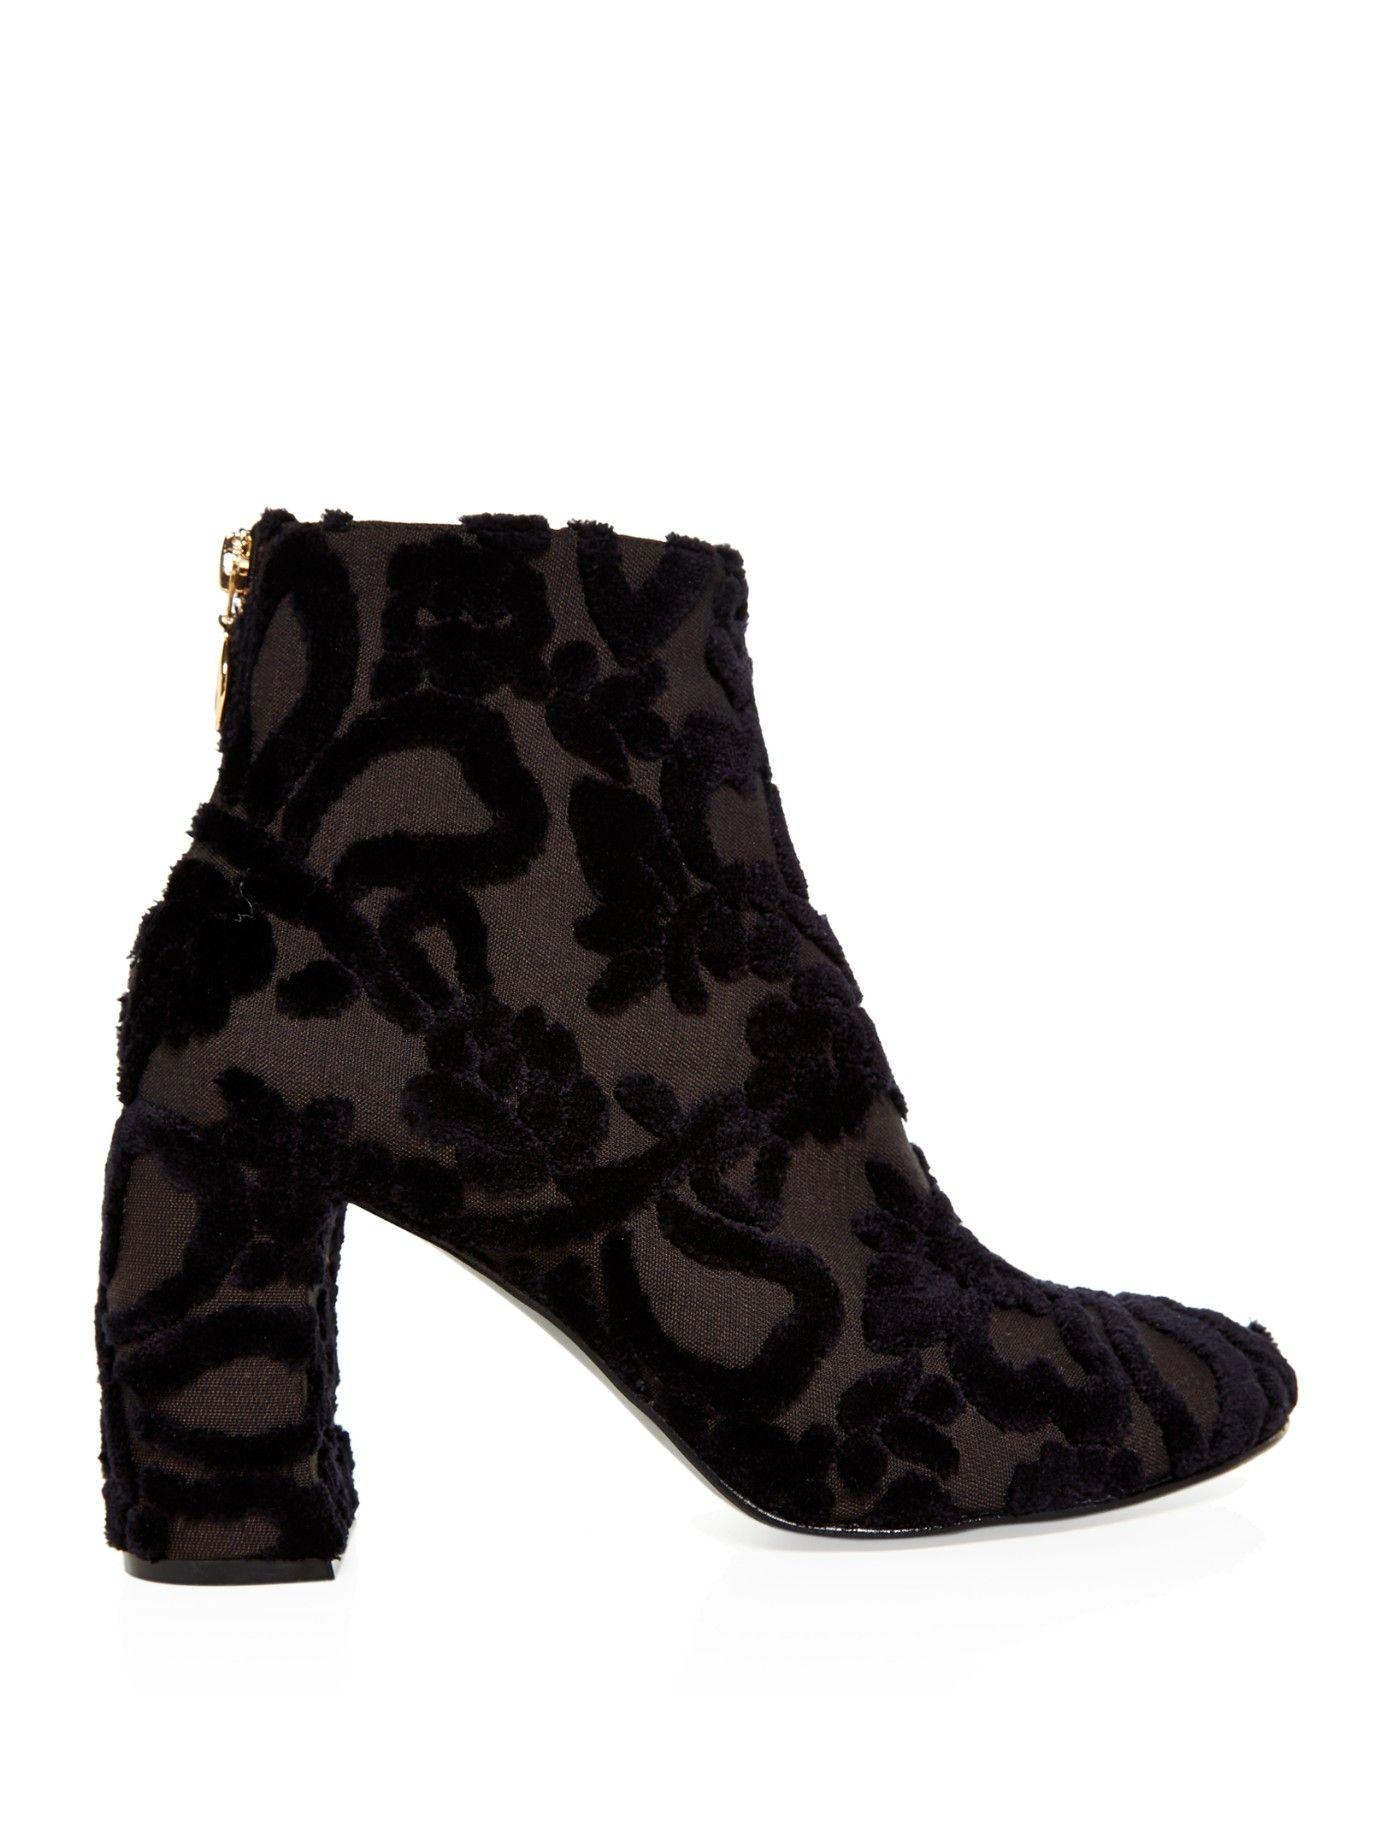 Stella McCartney Black Velvet Lug Sole Zip Boots 6s0SbnK1EE